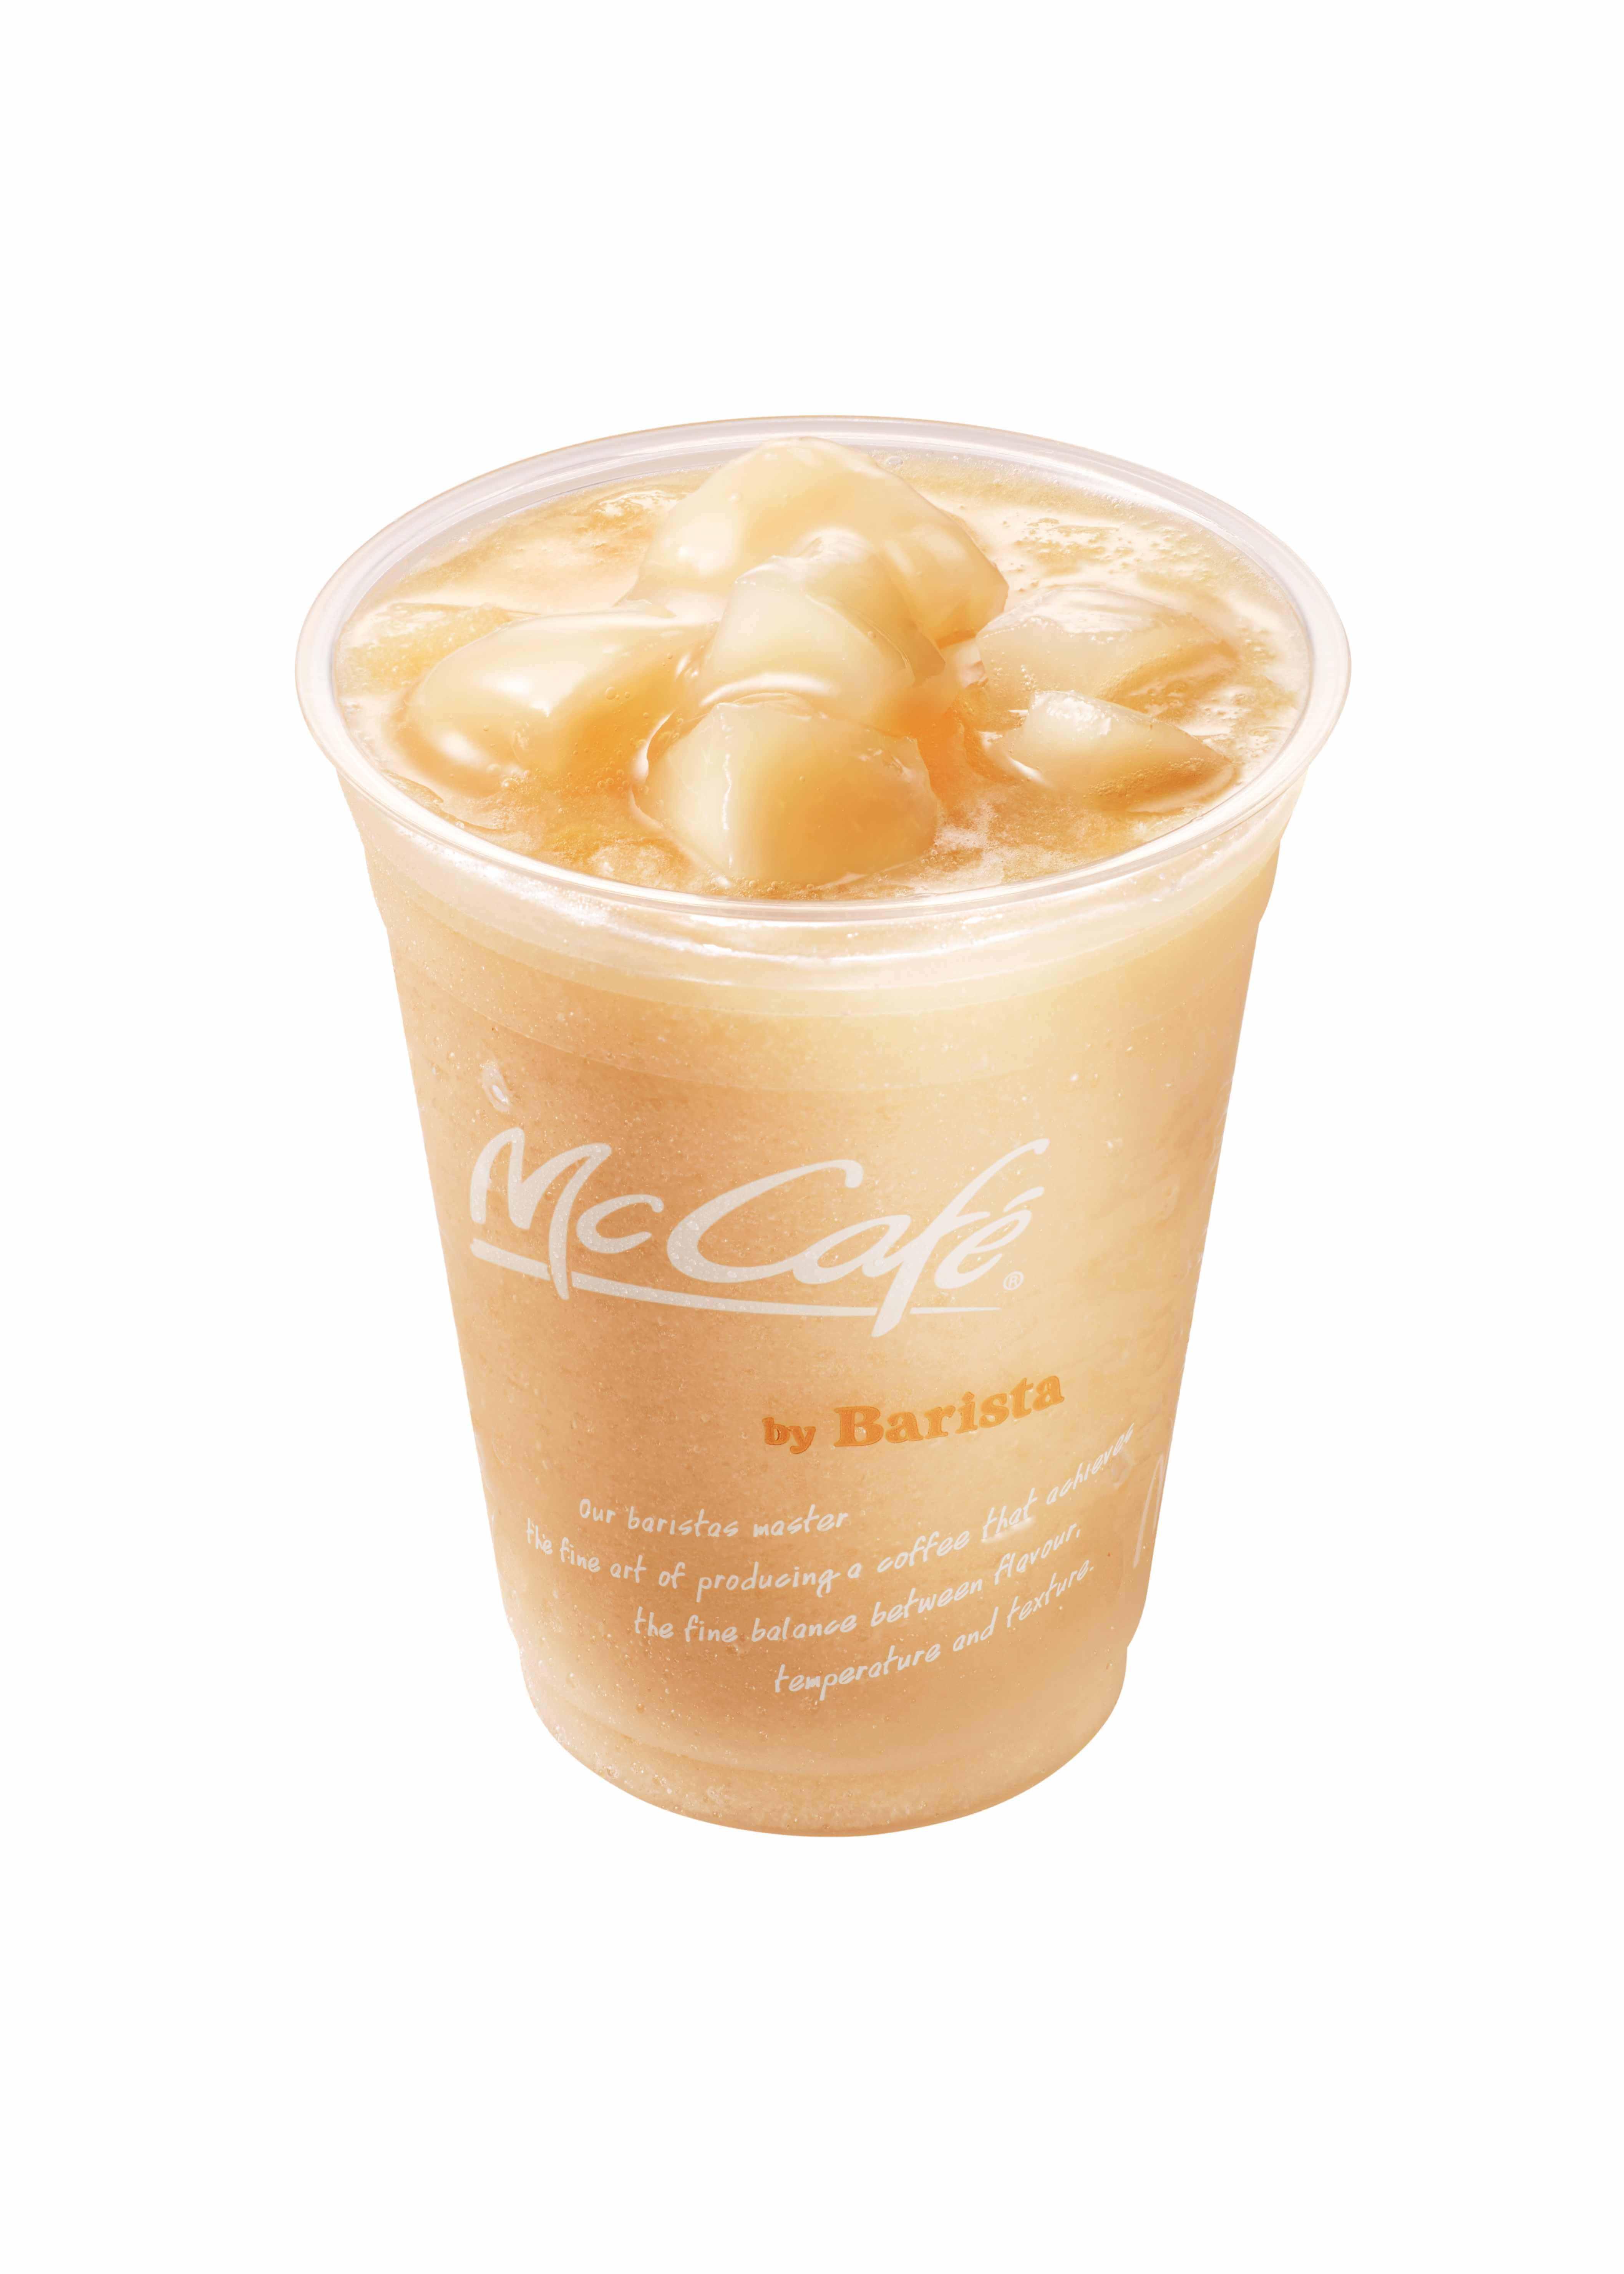 mccafe-mcdonald-%e3%83%90%e3%83%aa%e3%82%b9%e3%82%bf%e3%80%8c%e6%a1%83%e3%81%ae%e3%82%b9%e3%83%a0%e3%83%bc%e3%82%b8%e3%83%bc%e3%80%8d-peach-smoothie